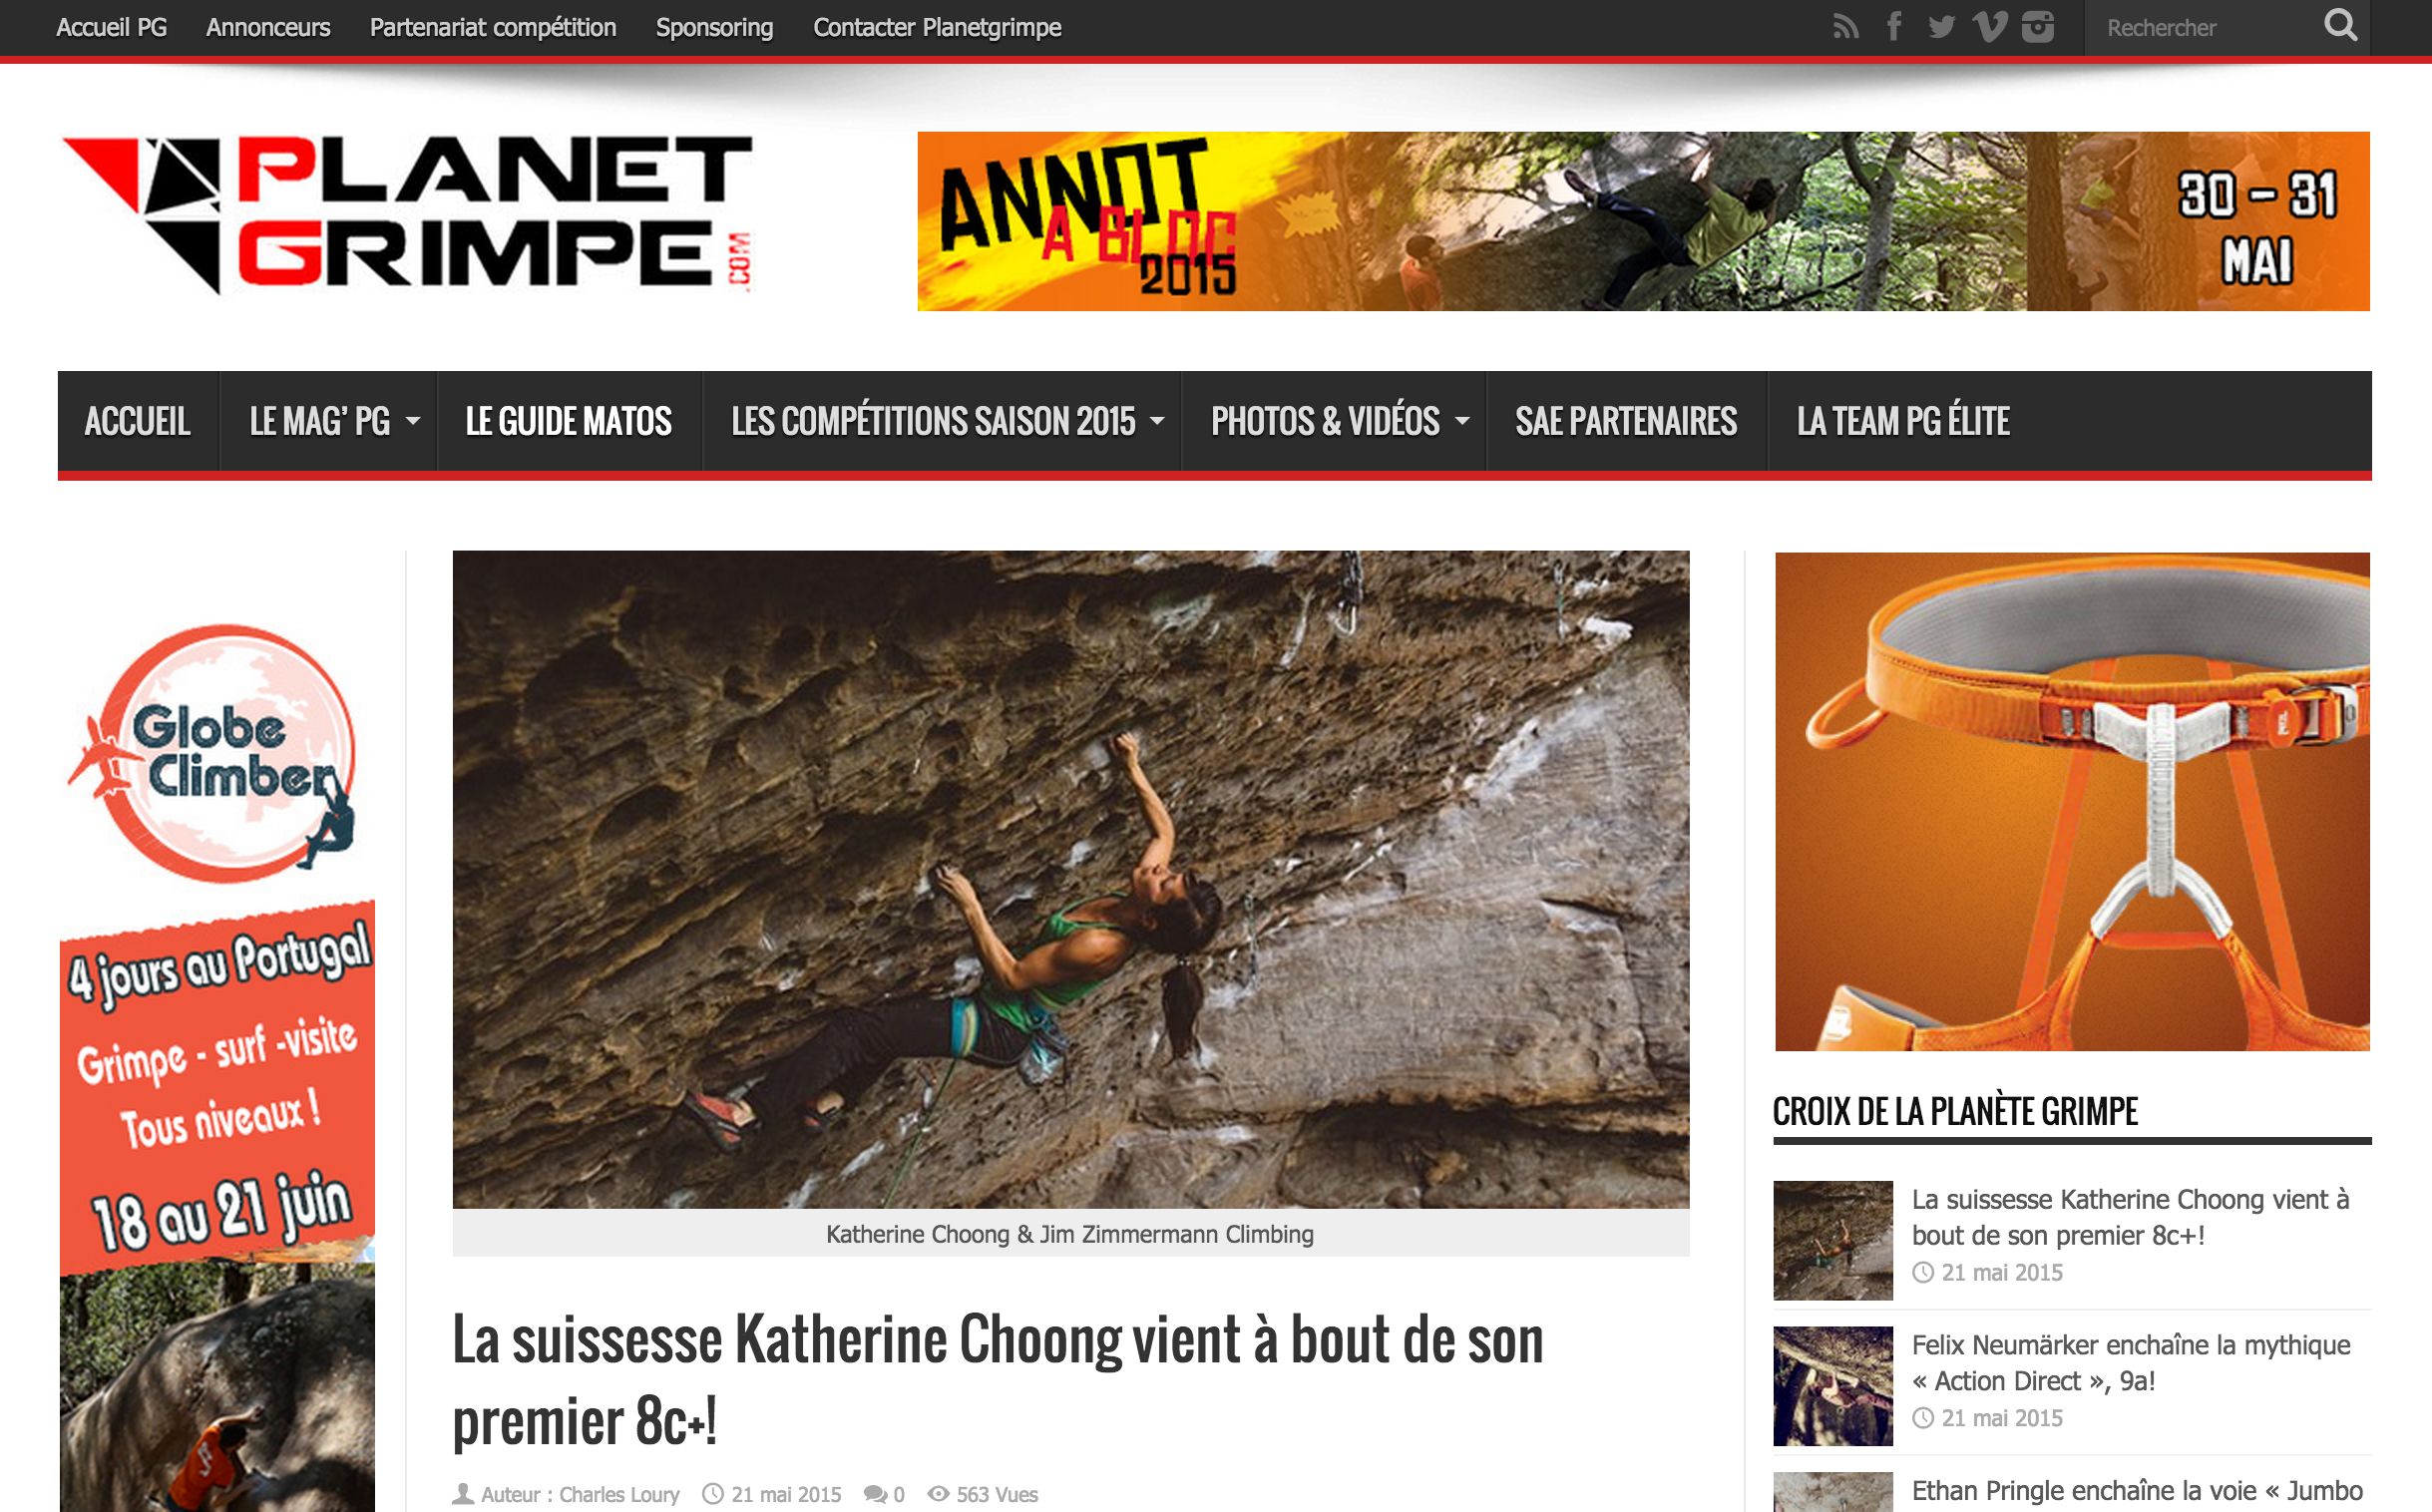 Planet Grimpe Katherine Choong Michael Lim Photography